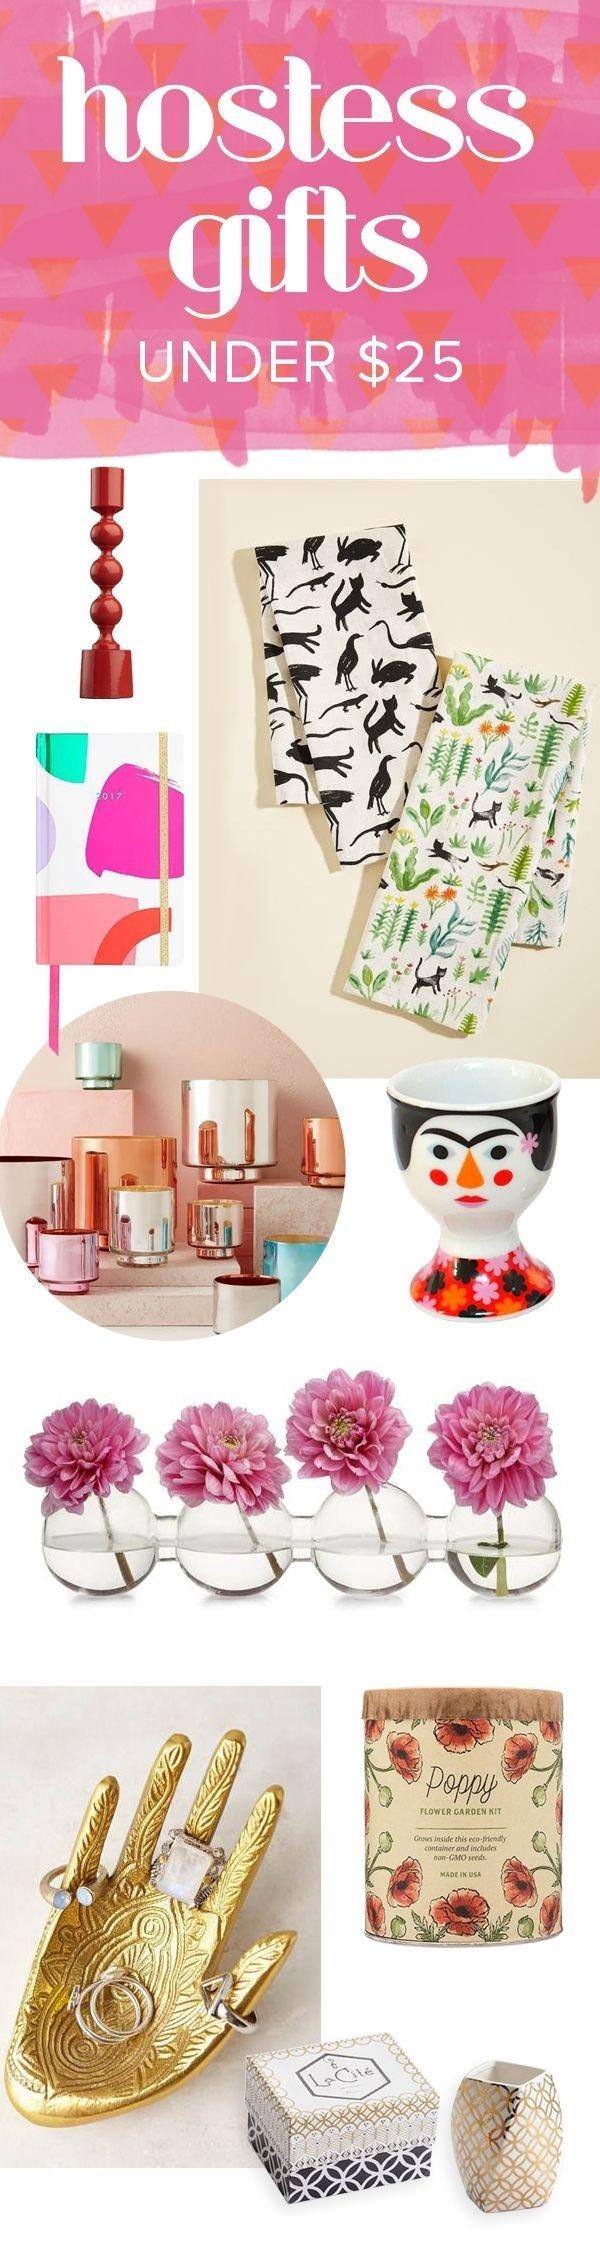 10 Stylish Christmas Party Hostess Gift Ideas 667 best hostess gift ideas images on pinterest gift ideas basket